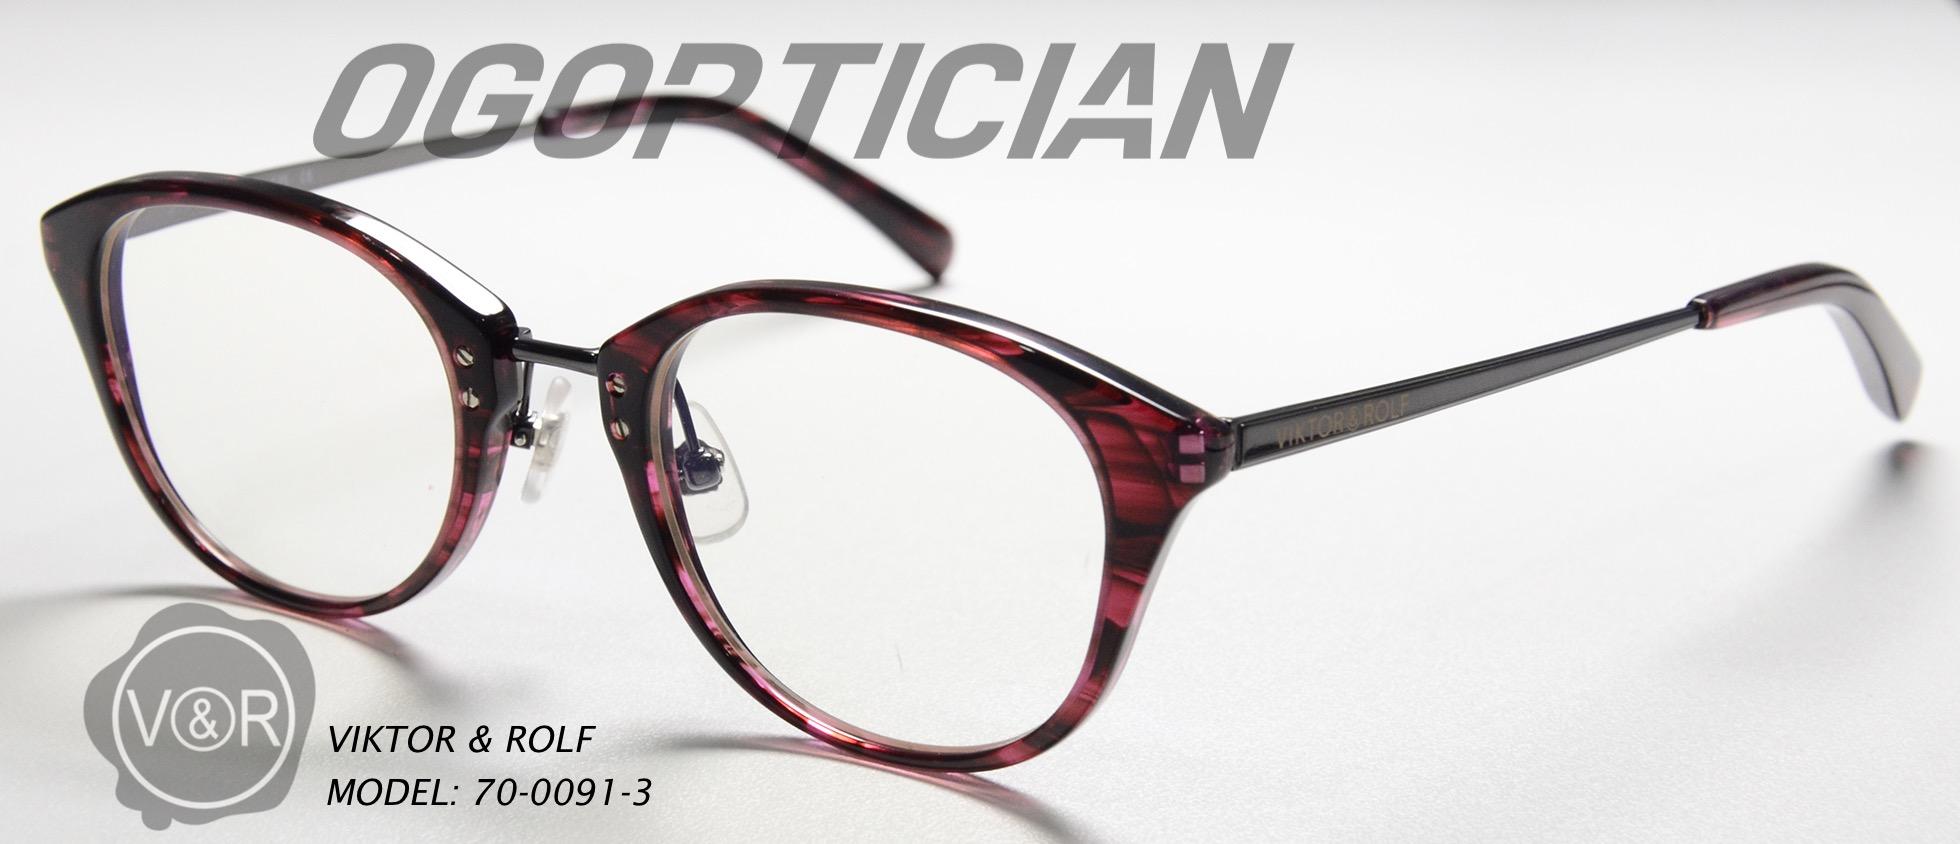 VIKTORANDROLF 70-0091-3